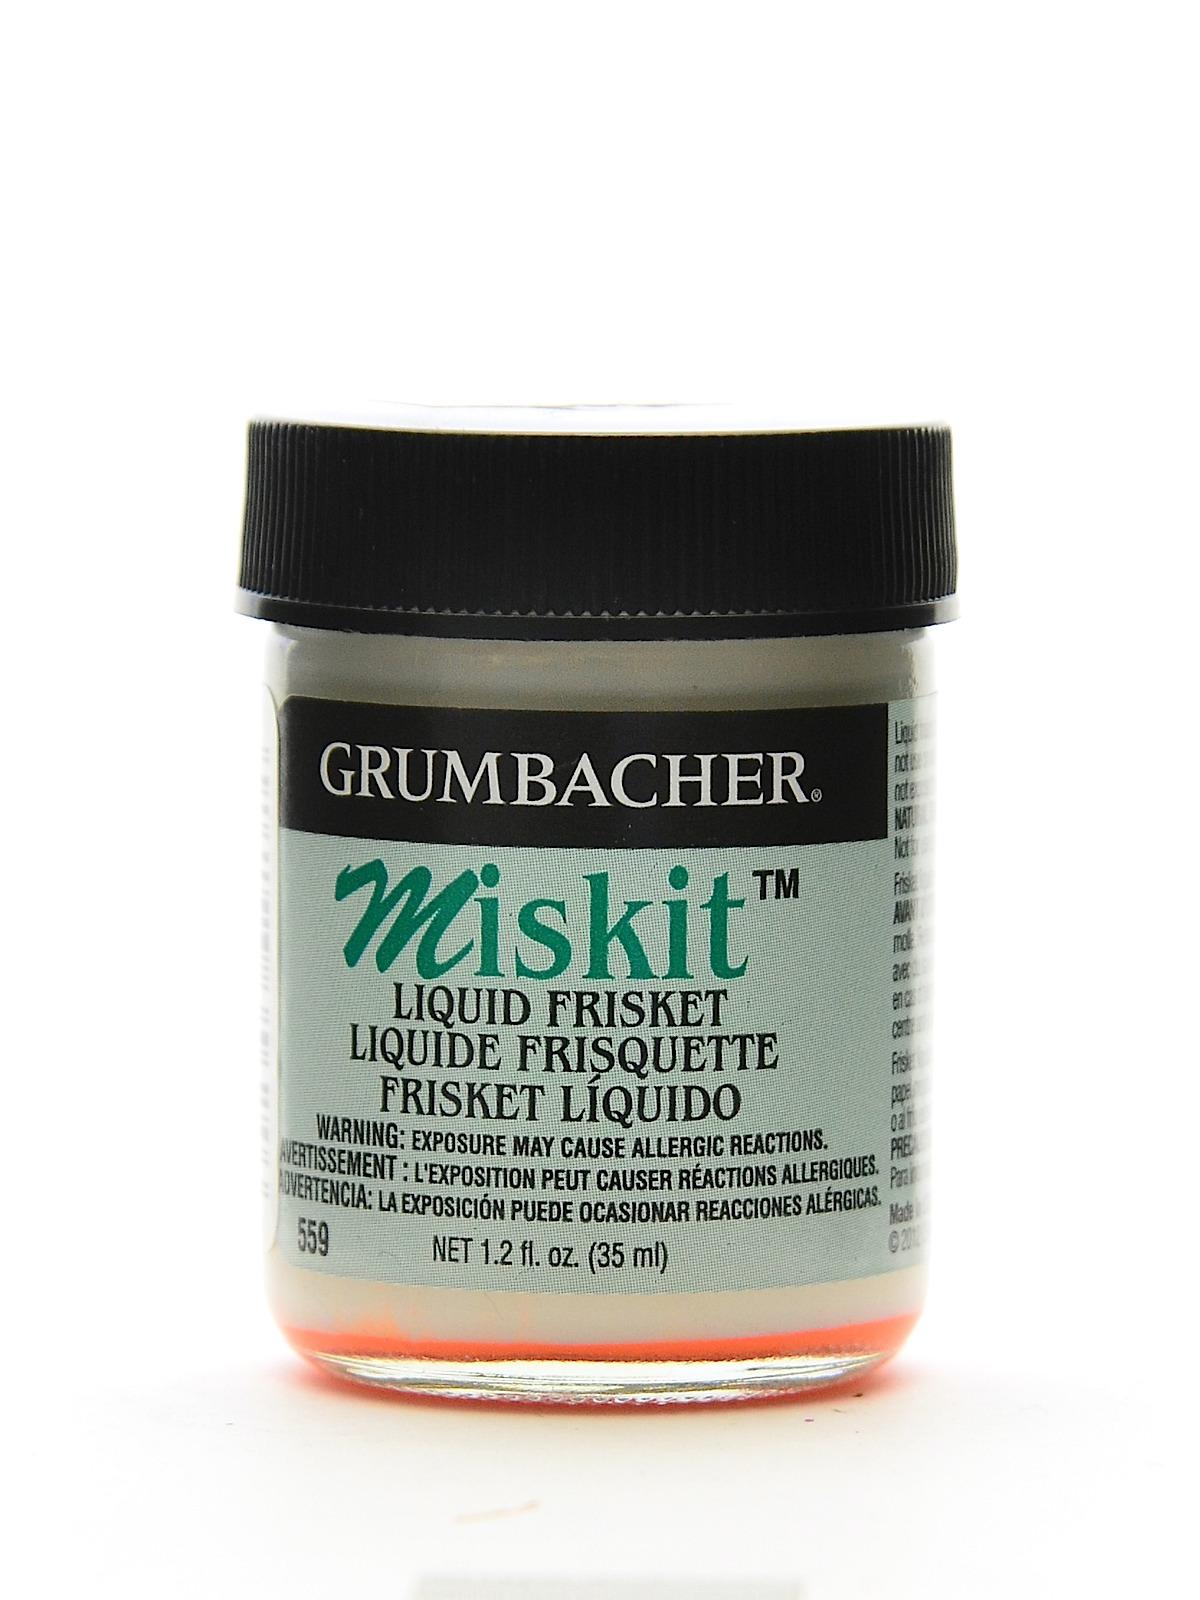 Grumbacher - Miskit Liquid Frisket